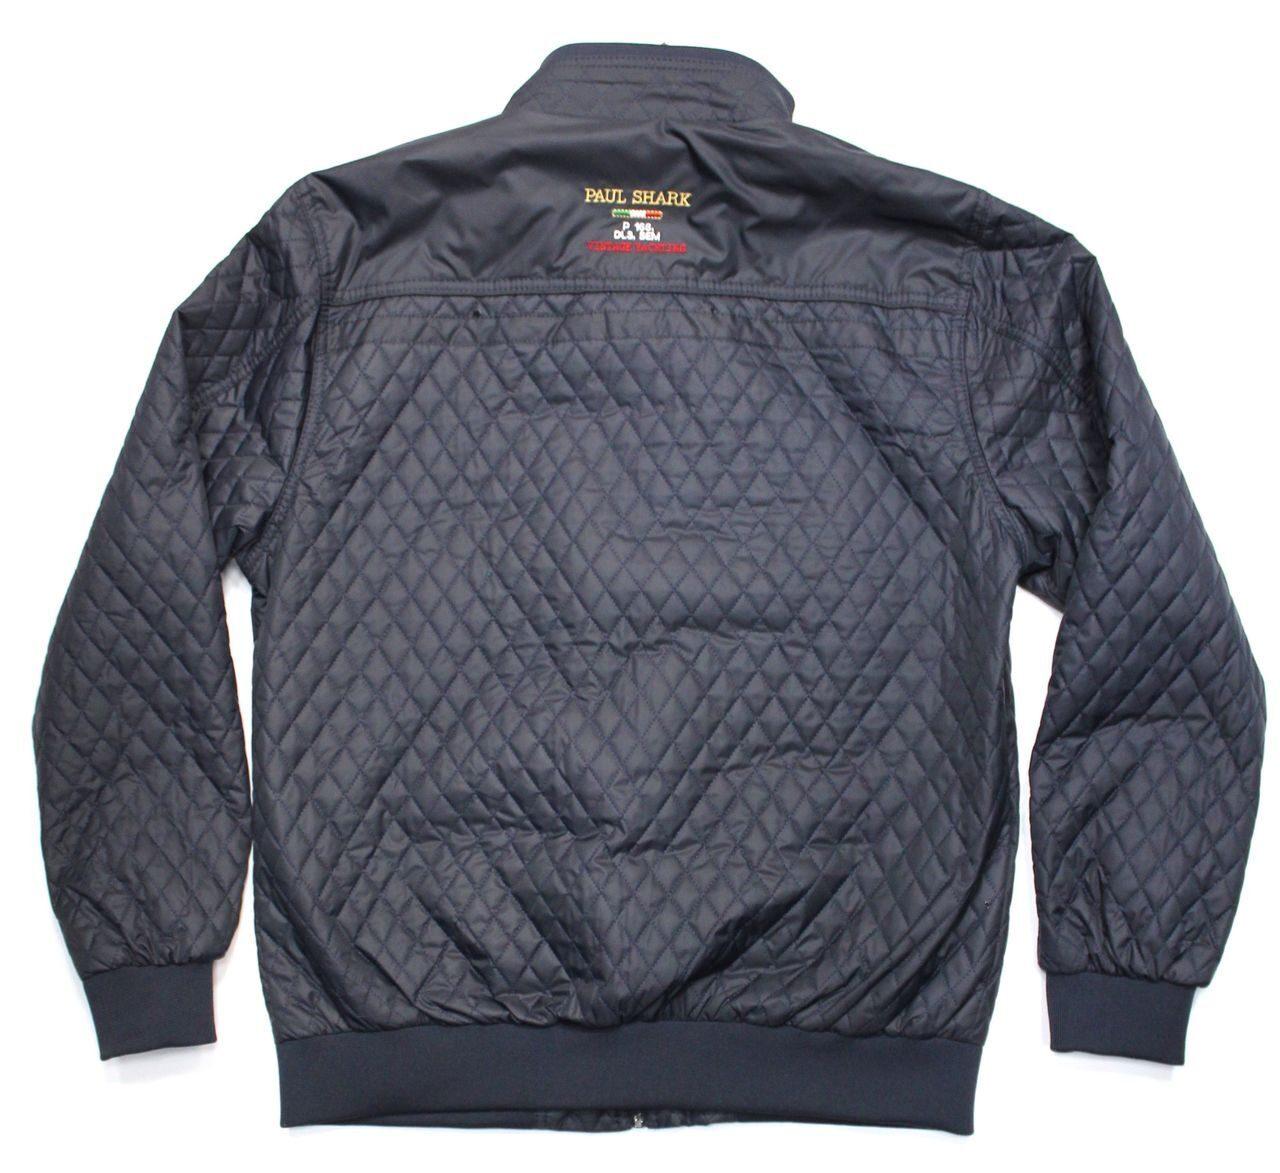 Купить Куртку Пол Шарк